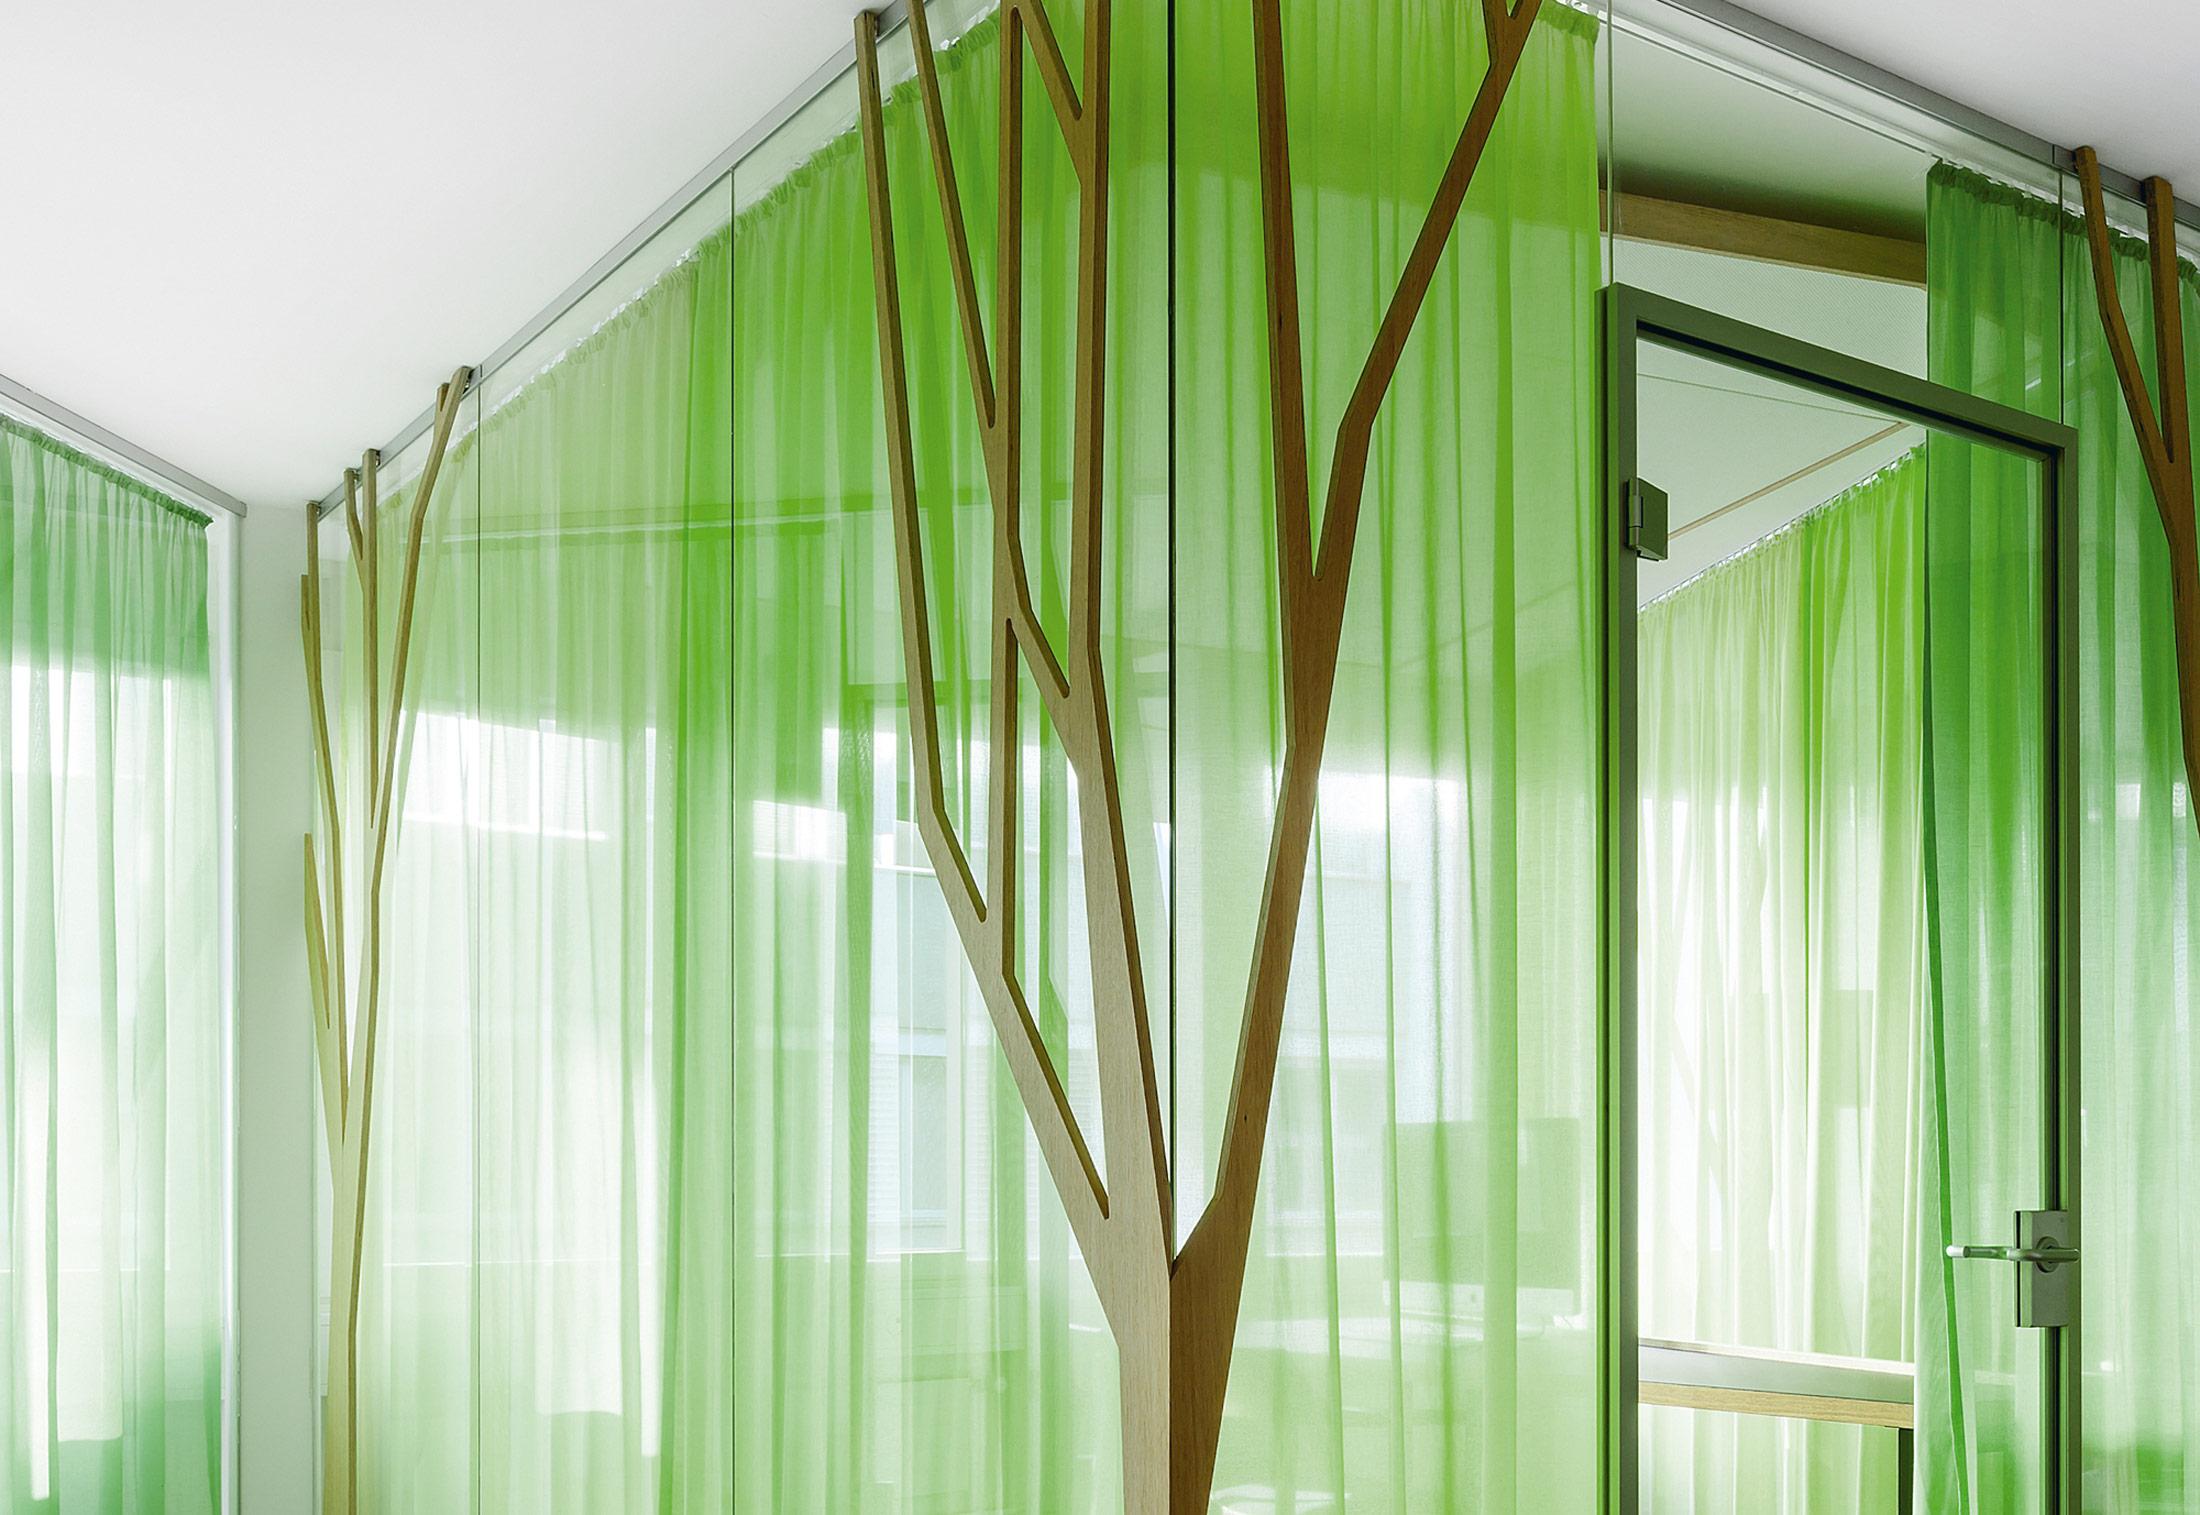 sinfonia cs v color von cr ation baumann stylepark. Black Bedroom Furniture Sets. Home Design Ideas